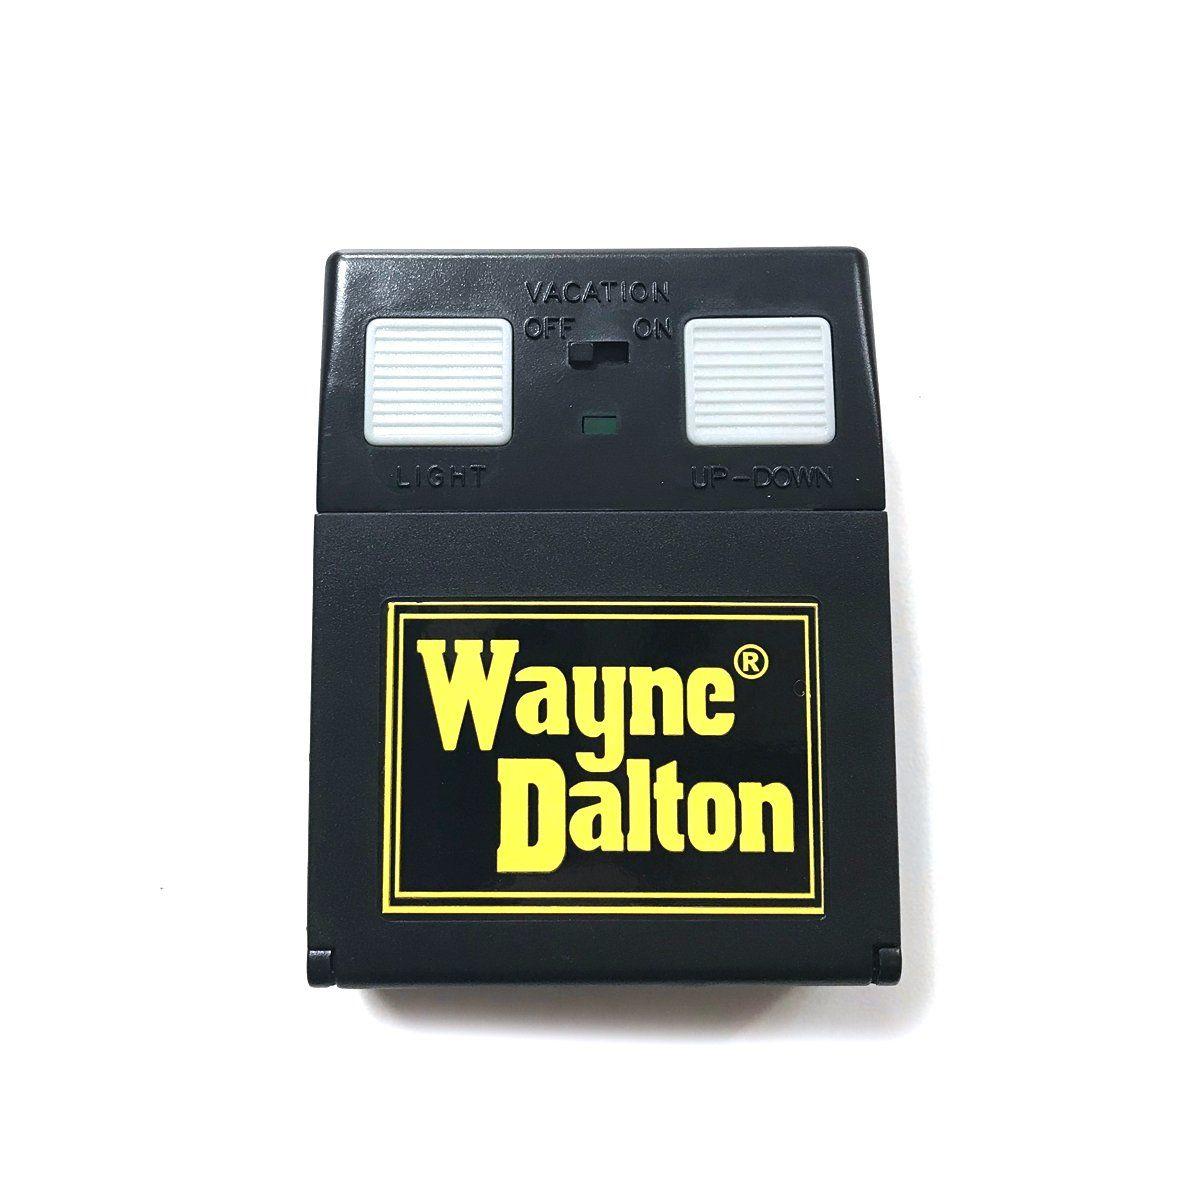 hight resolution of wayne dalton wireless wall station 297136 303 mhz wayne dalton garage doors garage door opener